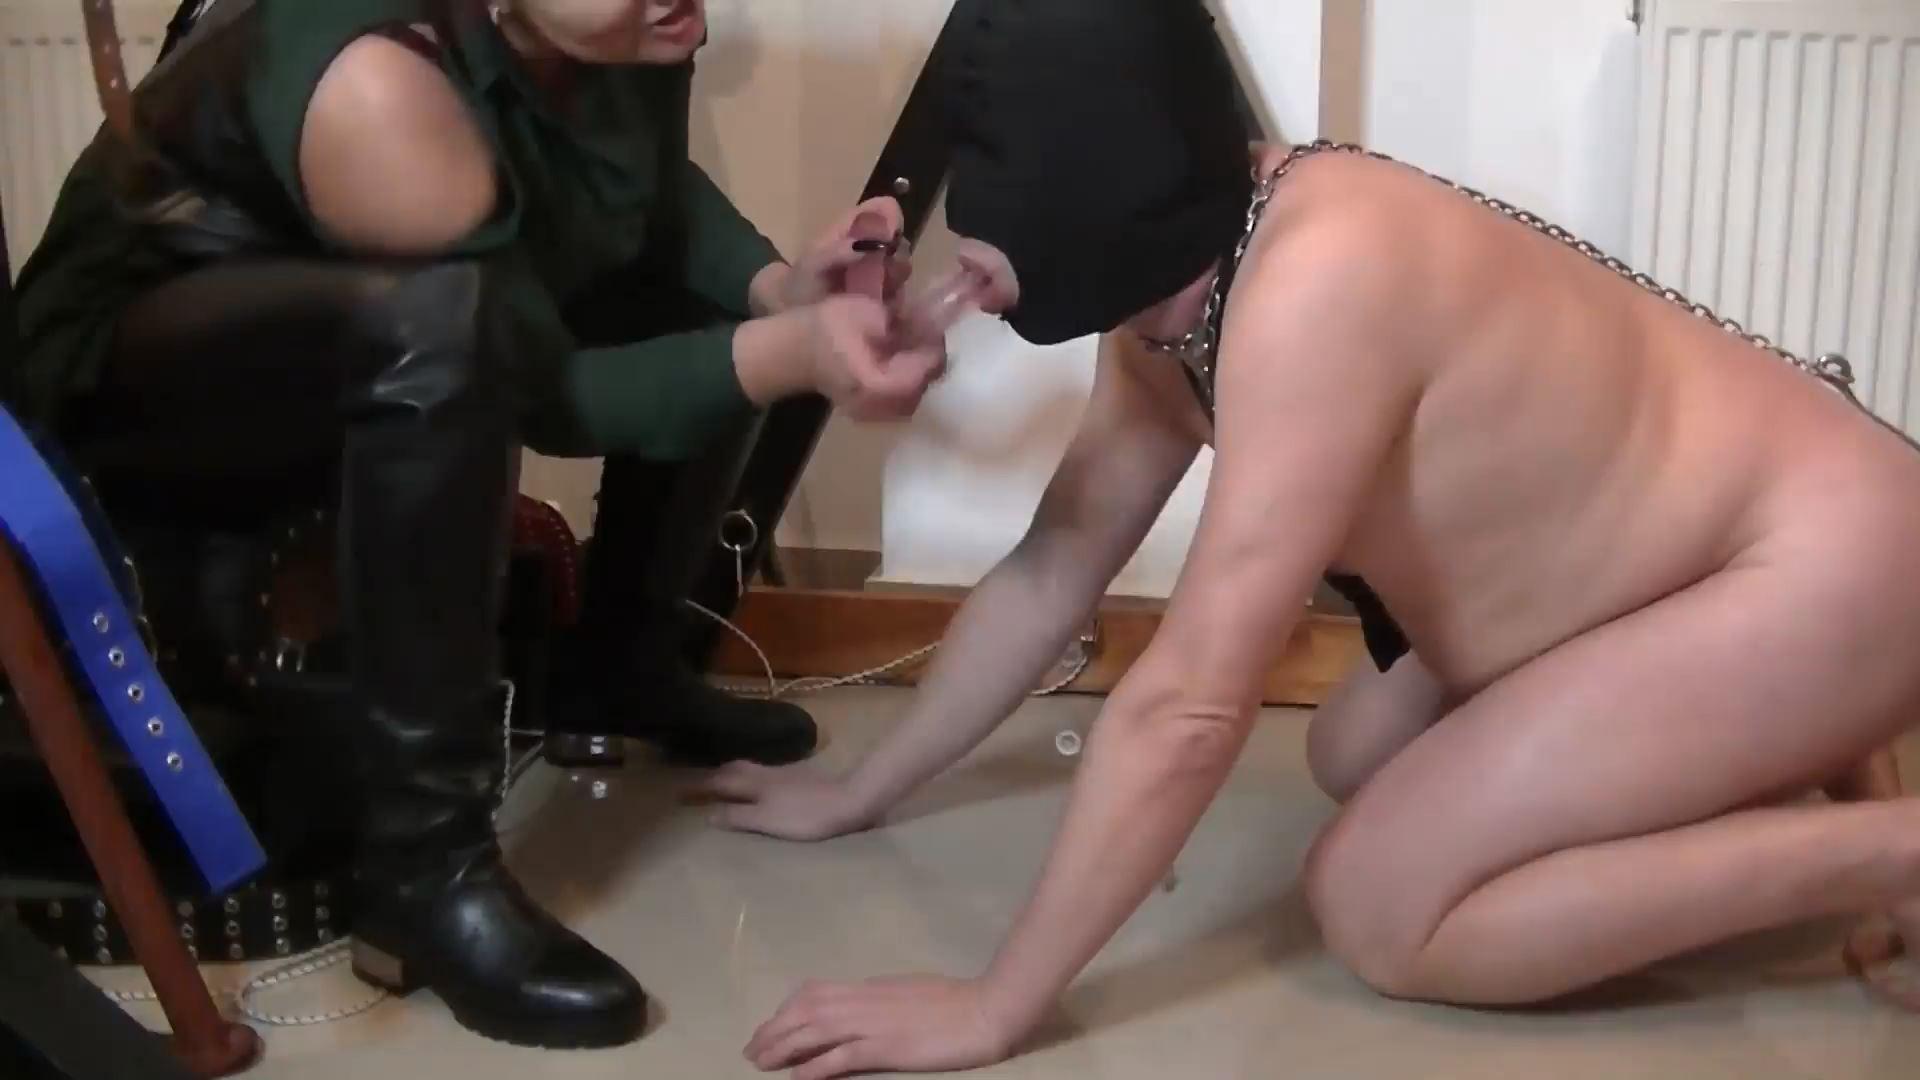 Goddess Andreea cbt pussy and ass sucking - BIZARRE GODDESSES - FULL HD/1080p/MP4